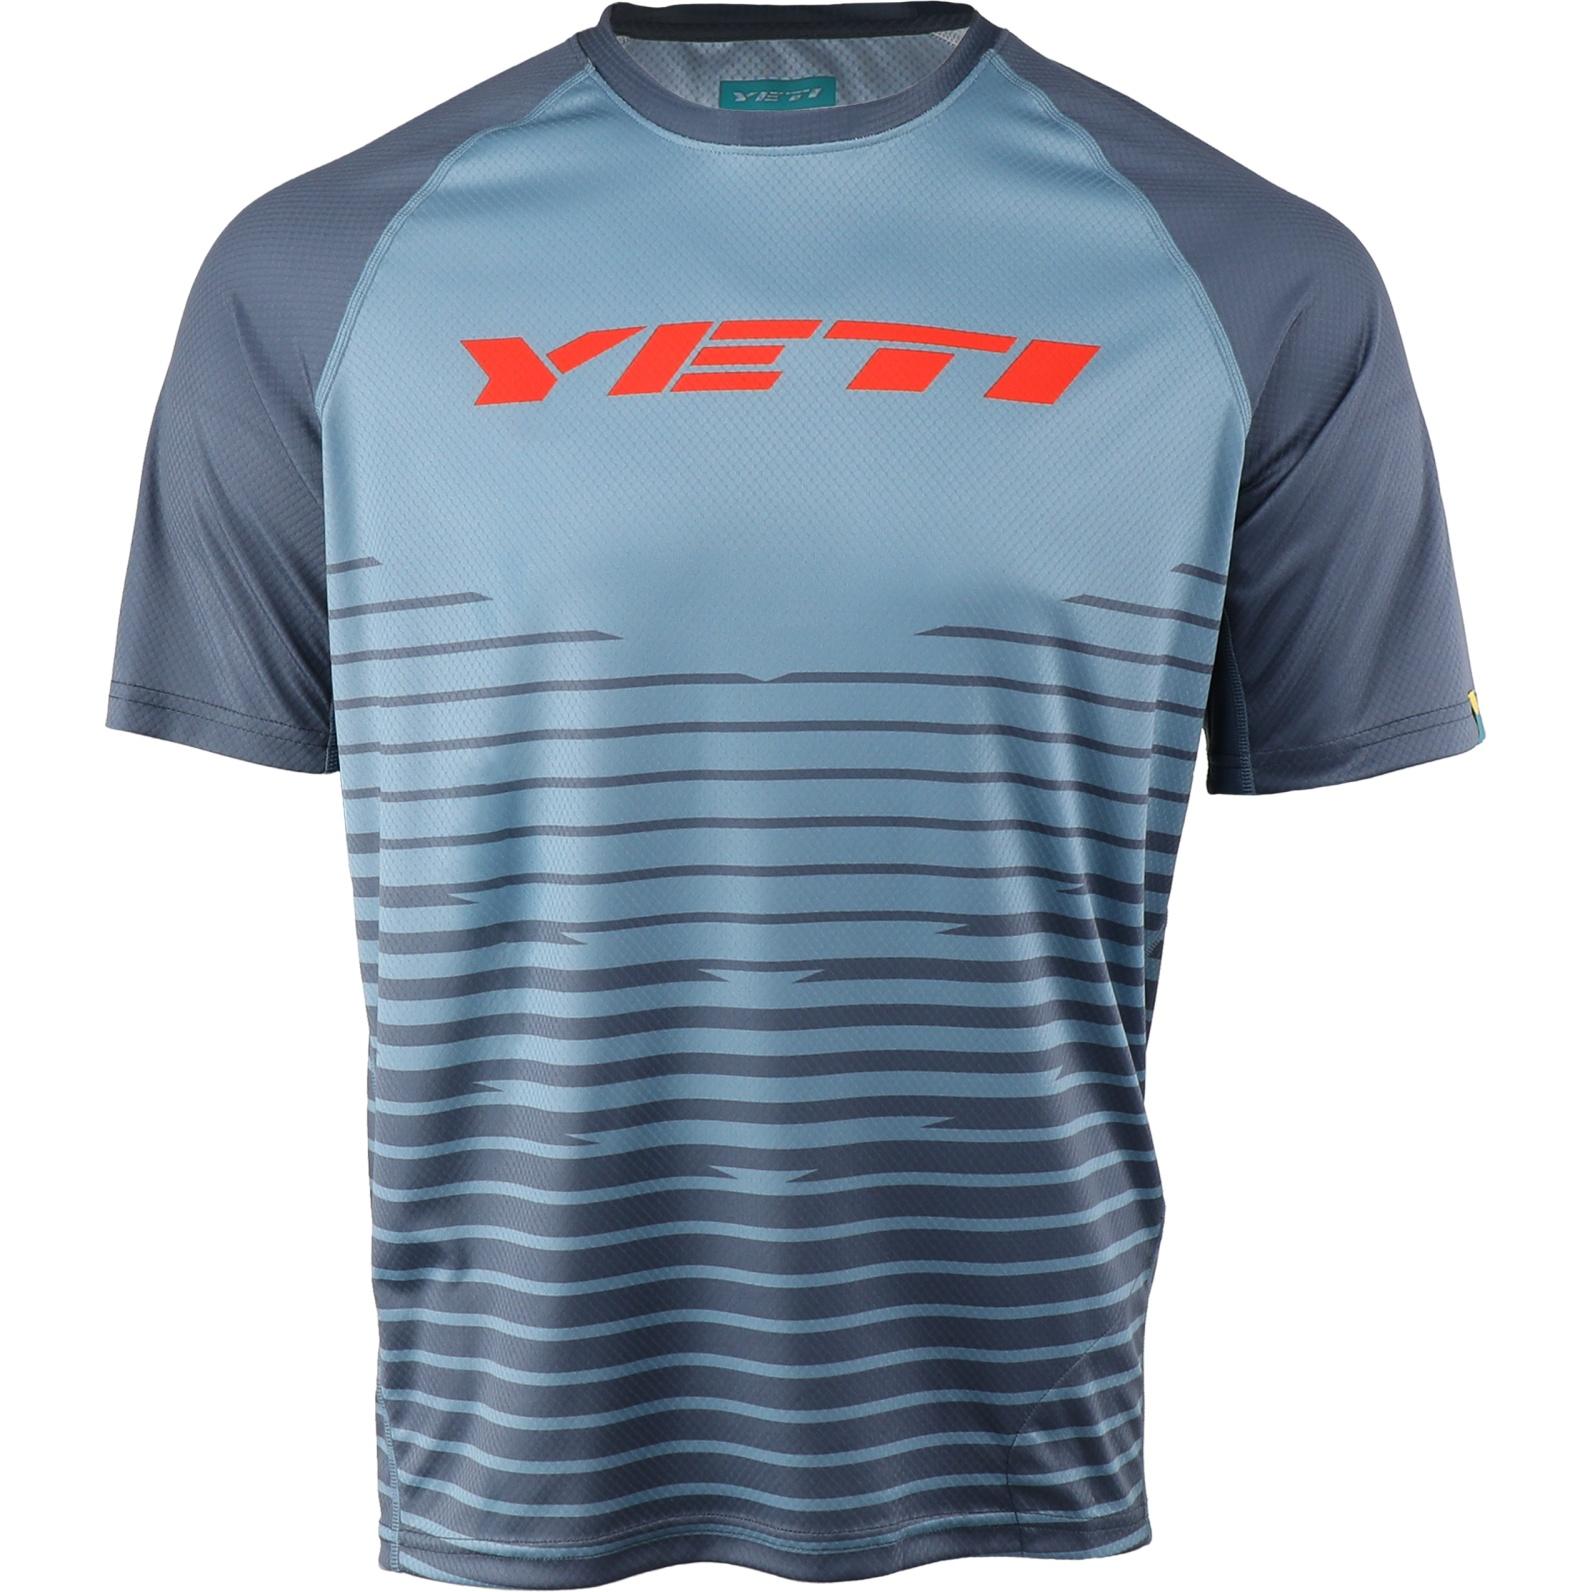 Yeti Cycles Longhorn Short Sleeve Jersey - Slate